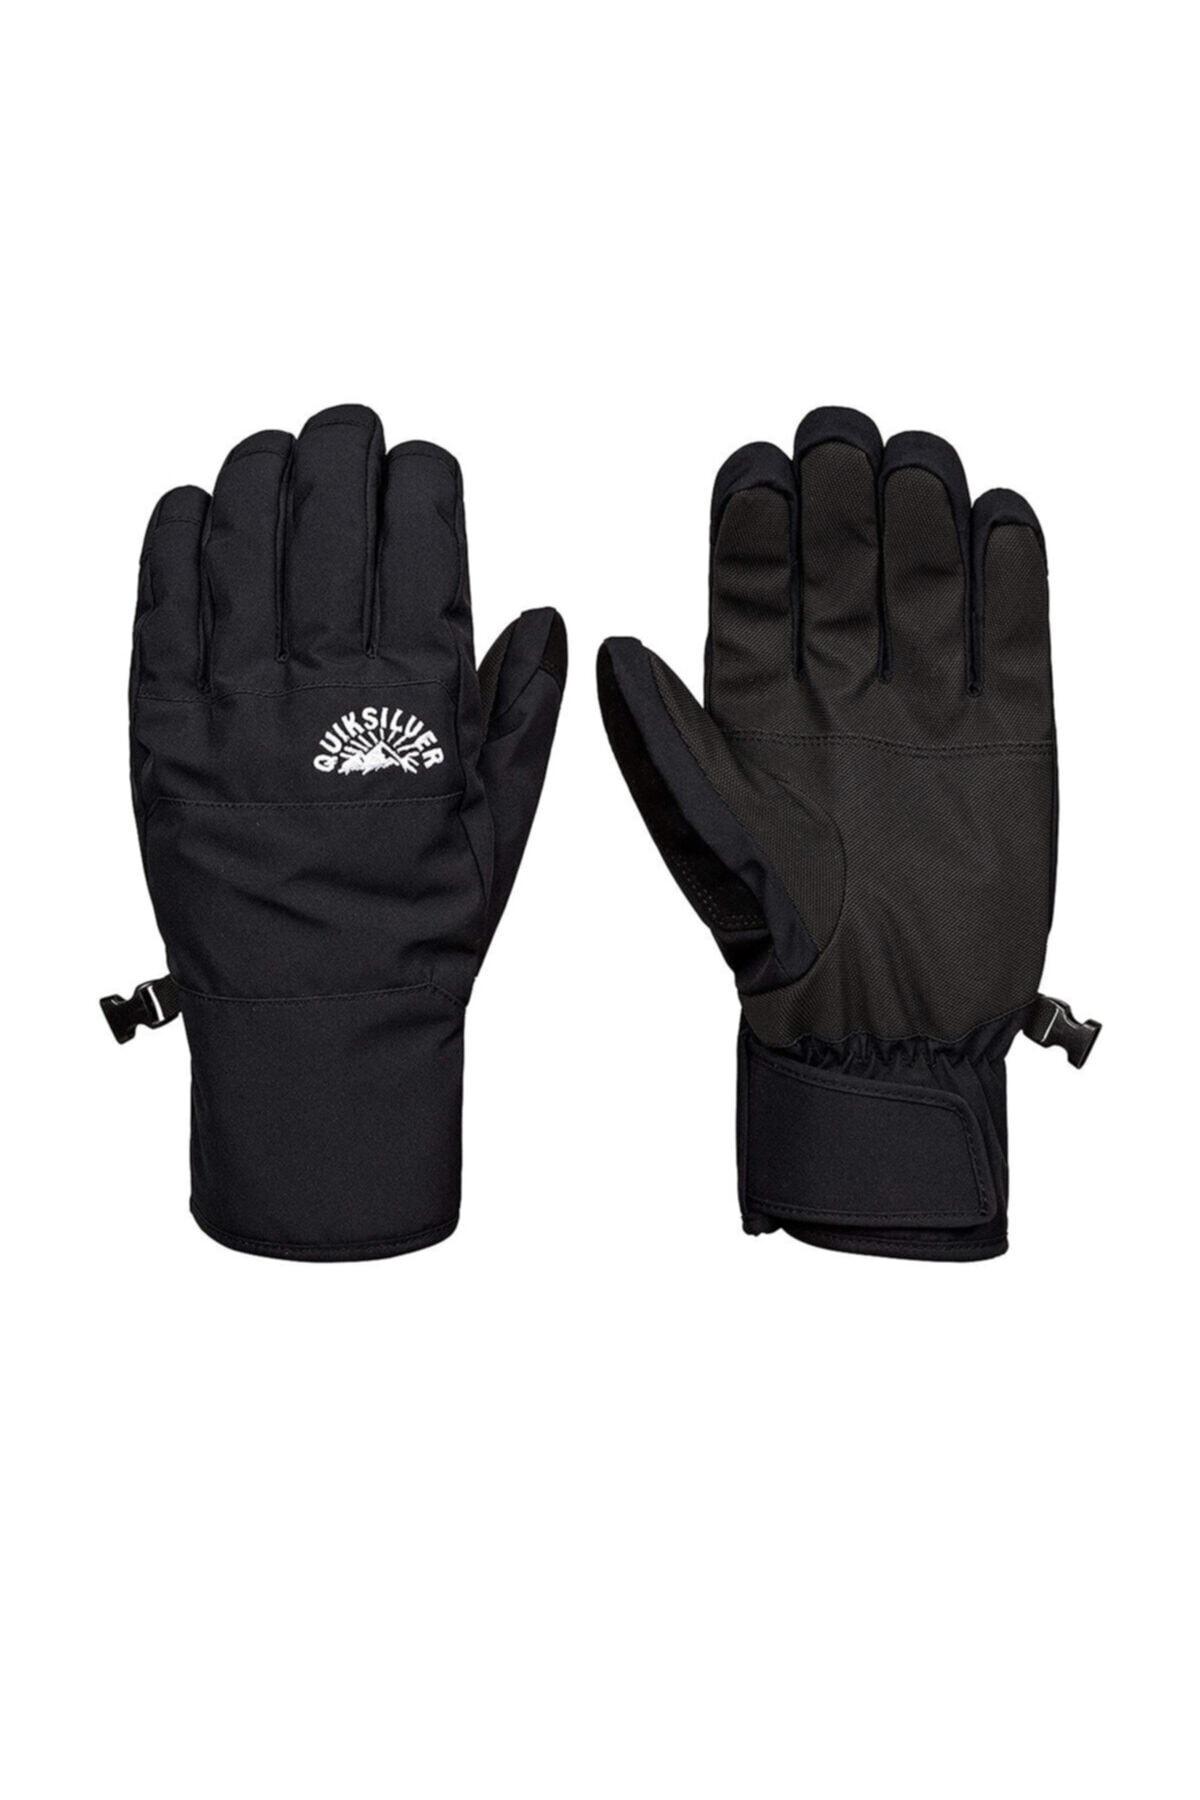 Quiksilver Cross Glove M Glov Prm0 Siyah Erkek Eldiven 1